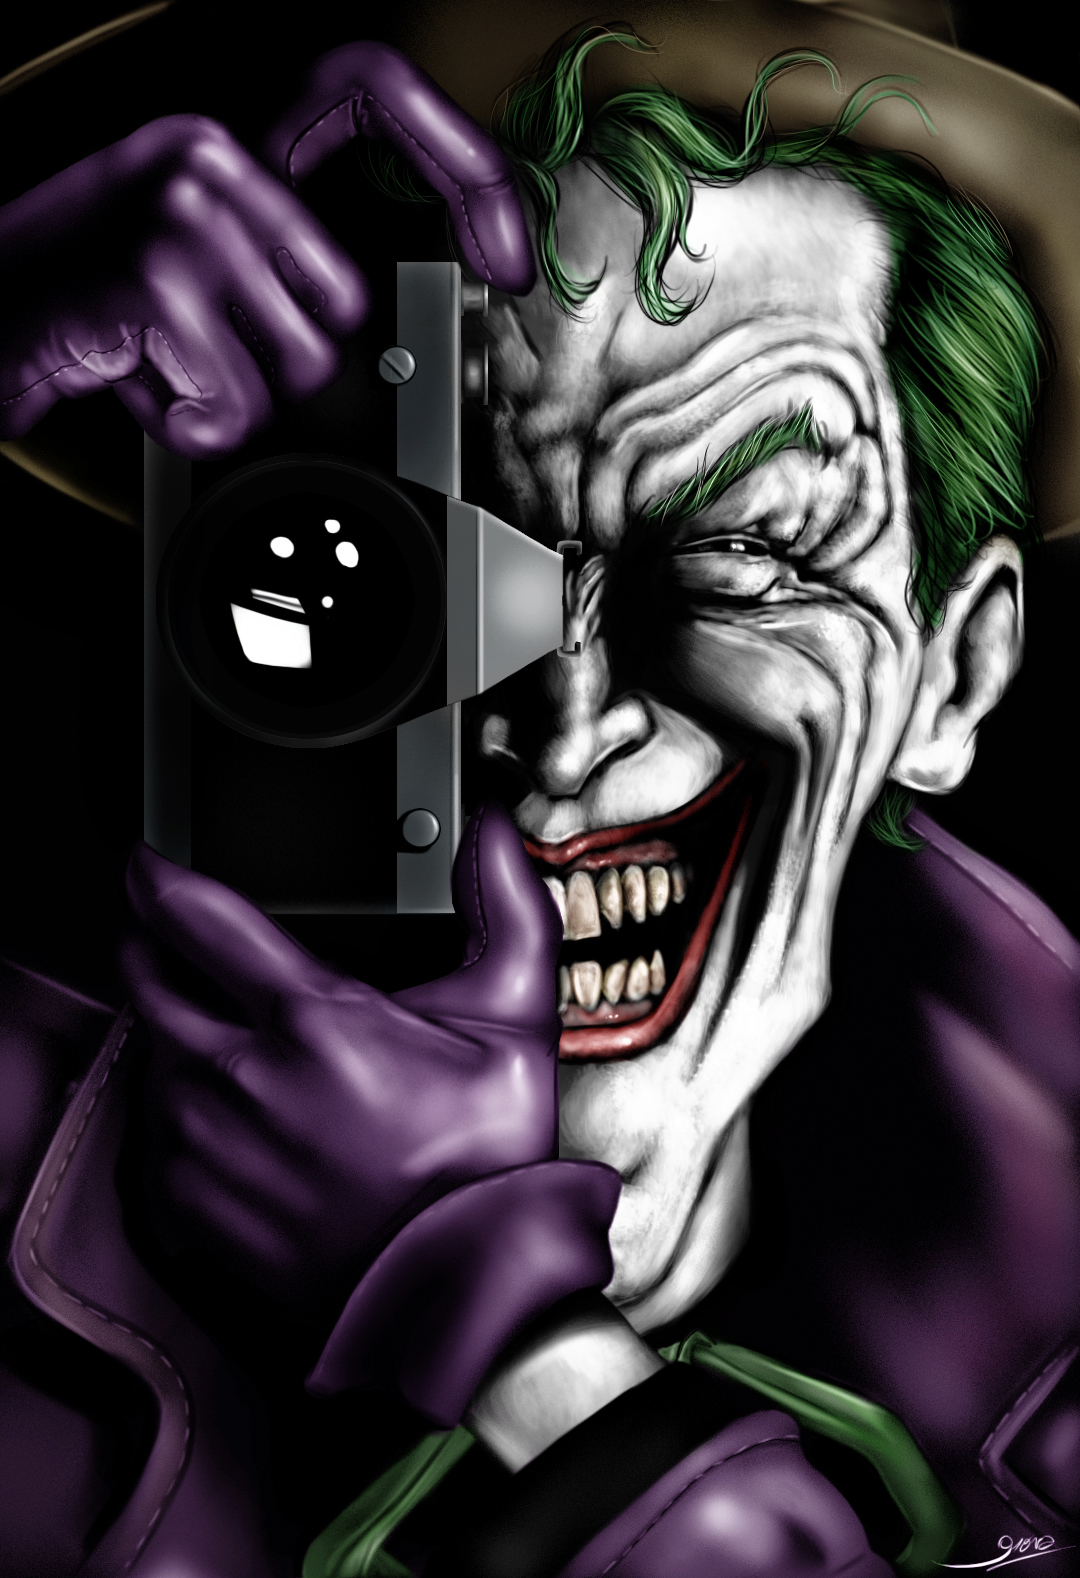 Batman The Killing Joke Wallpaper The killing joke by giova94 1080x1578